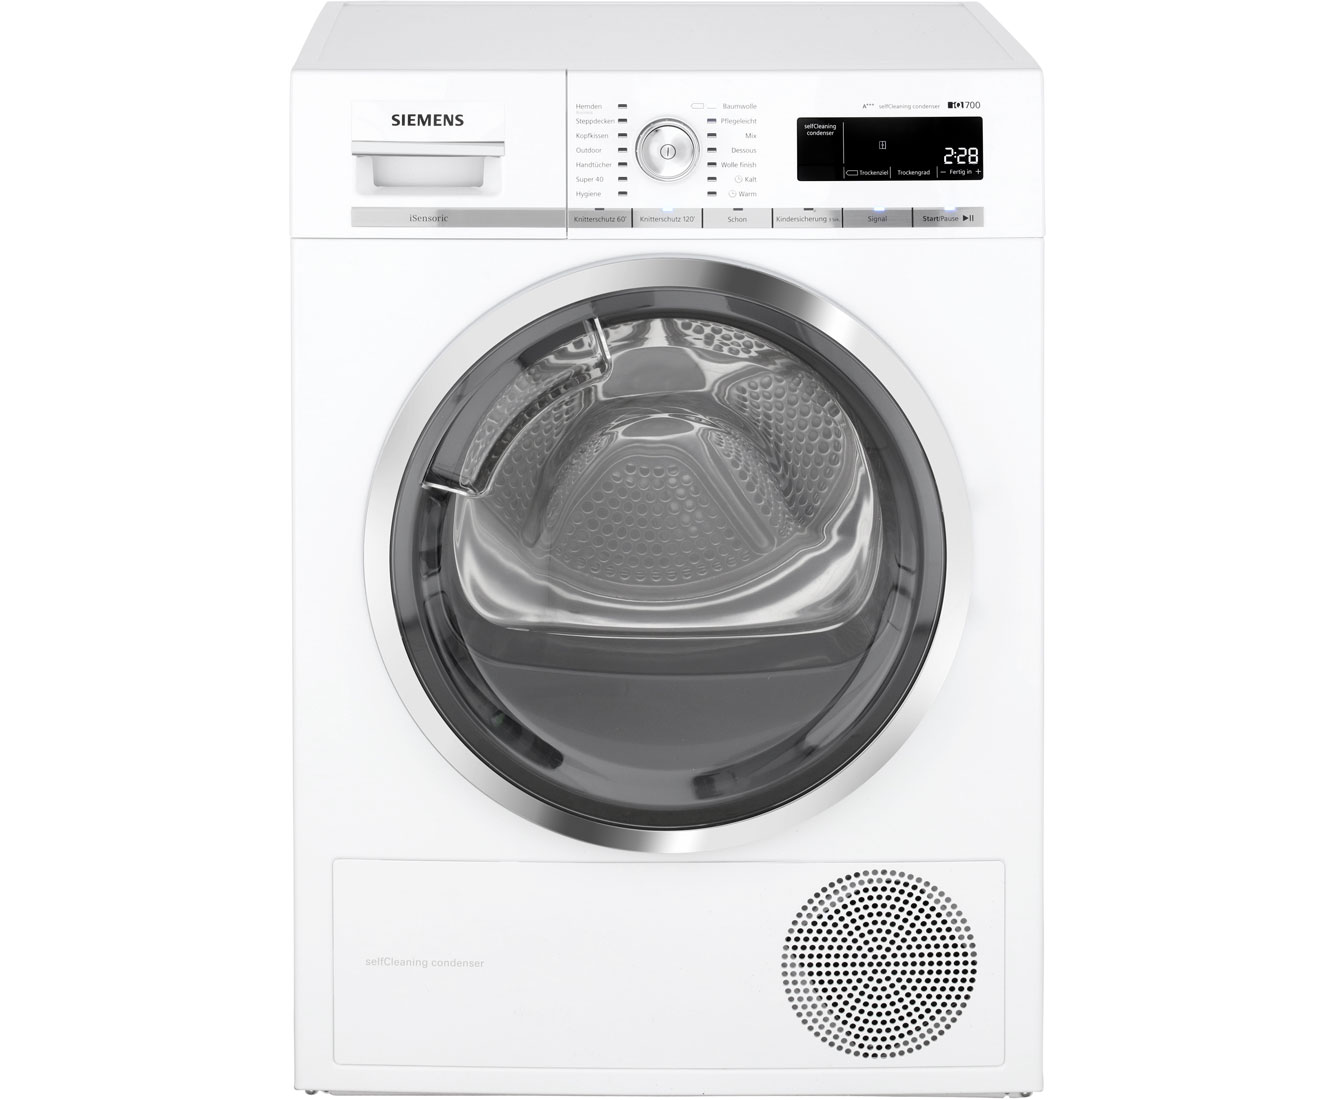 Rabatt preisvergleich.de haushalt waschen & trocknen